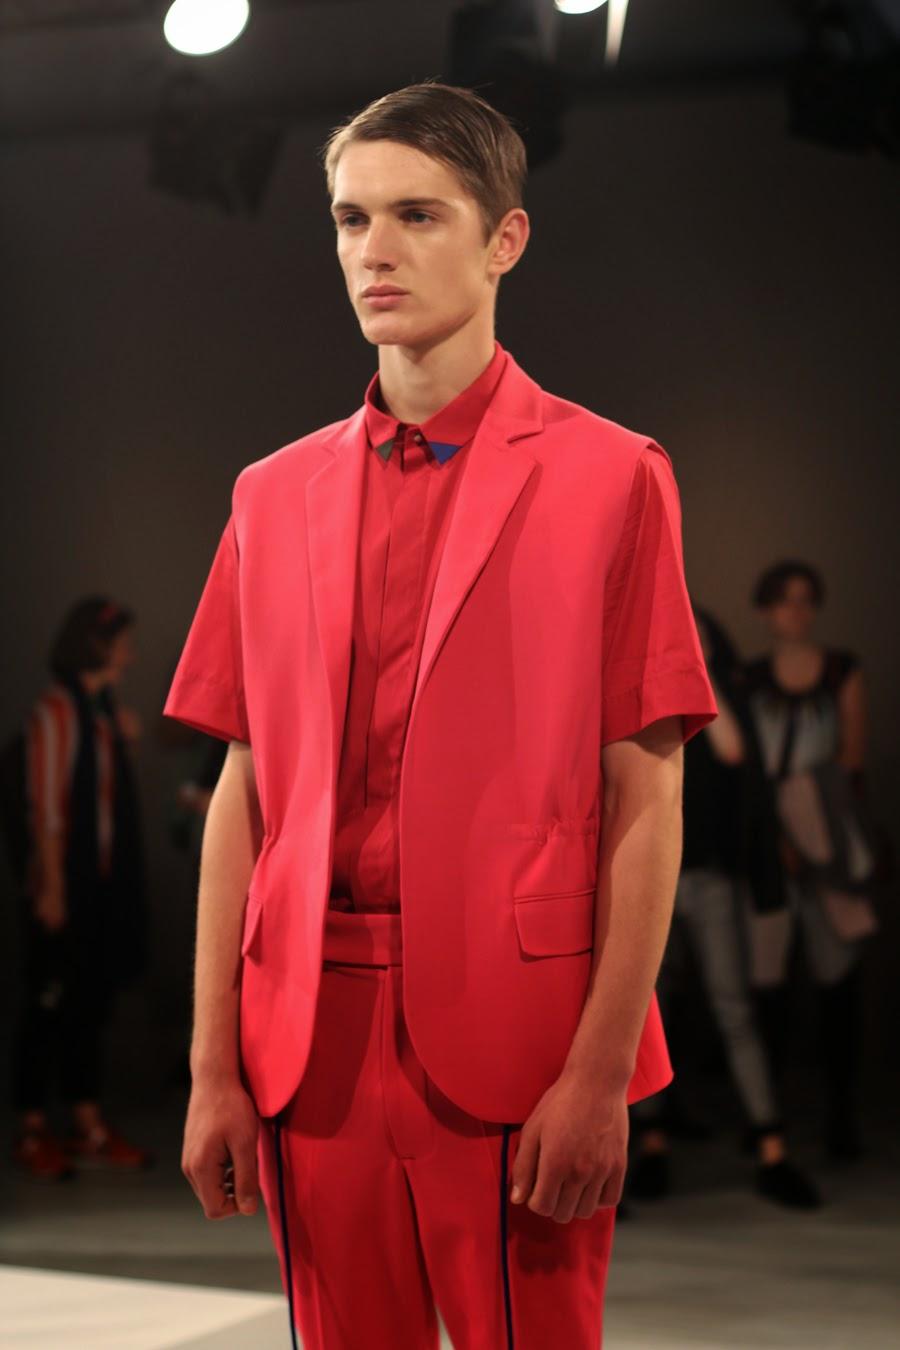 ivan man mercedes benz fashion week  roter anzug